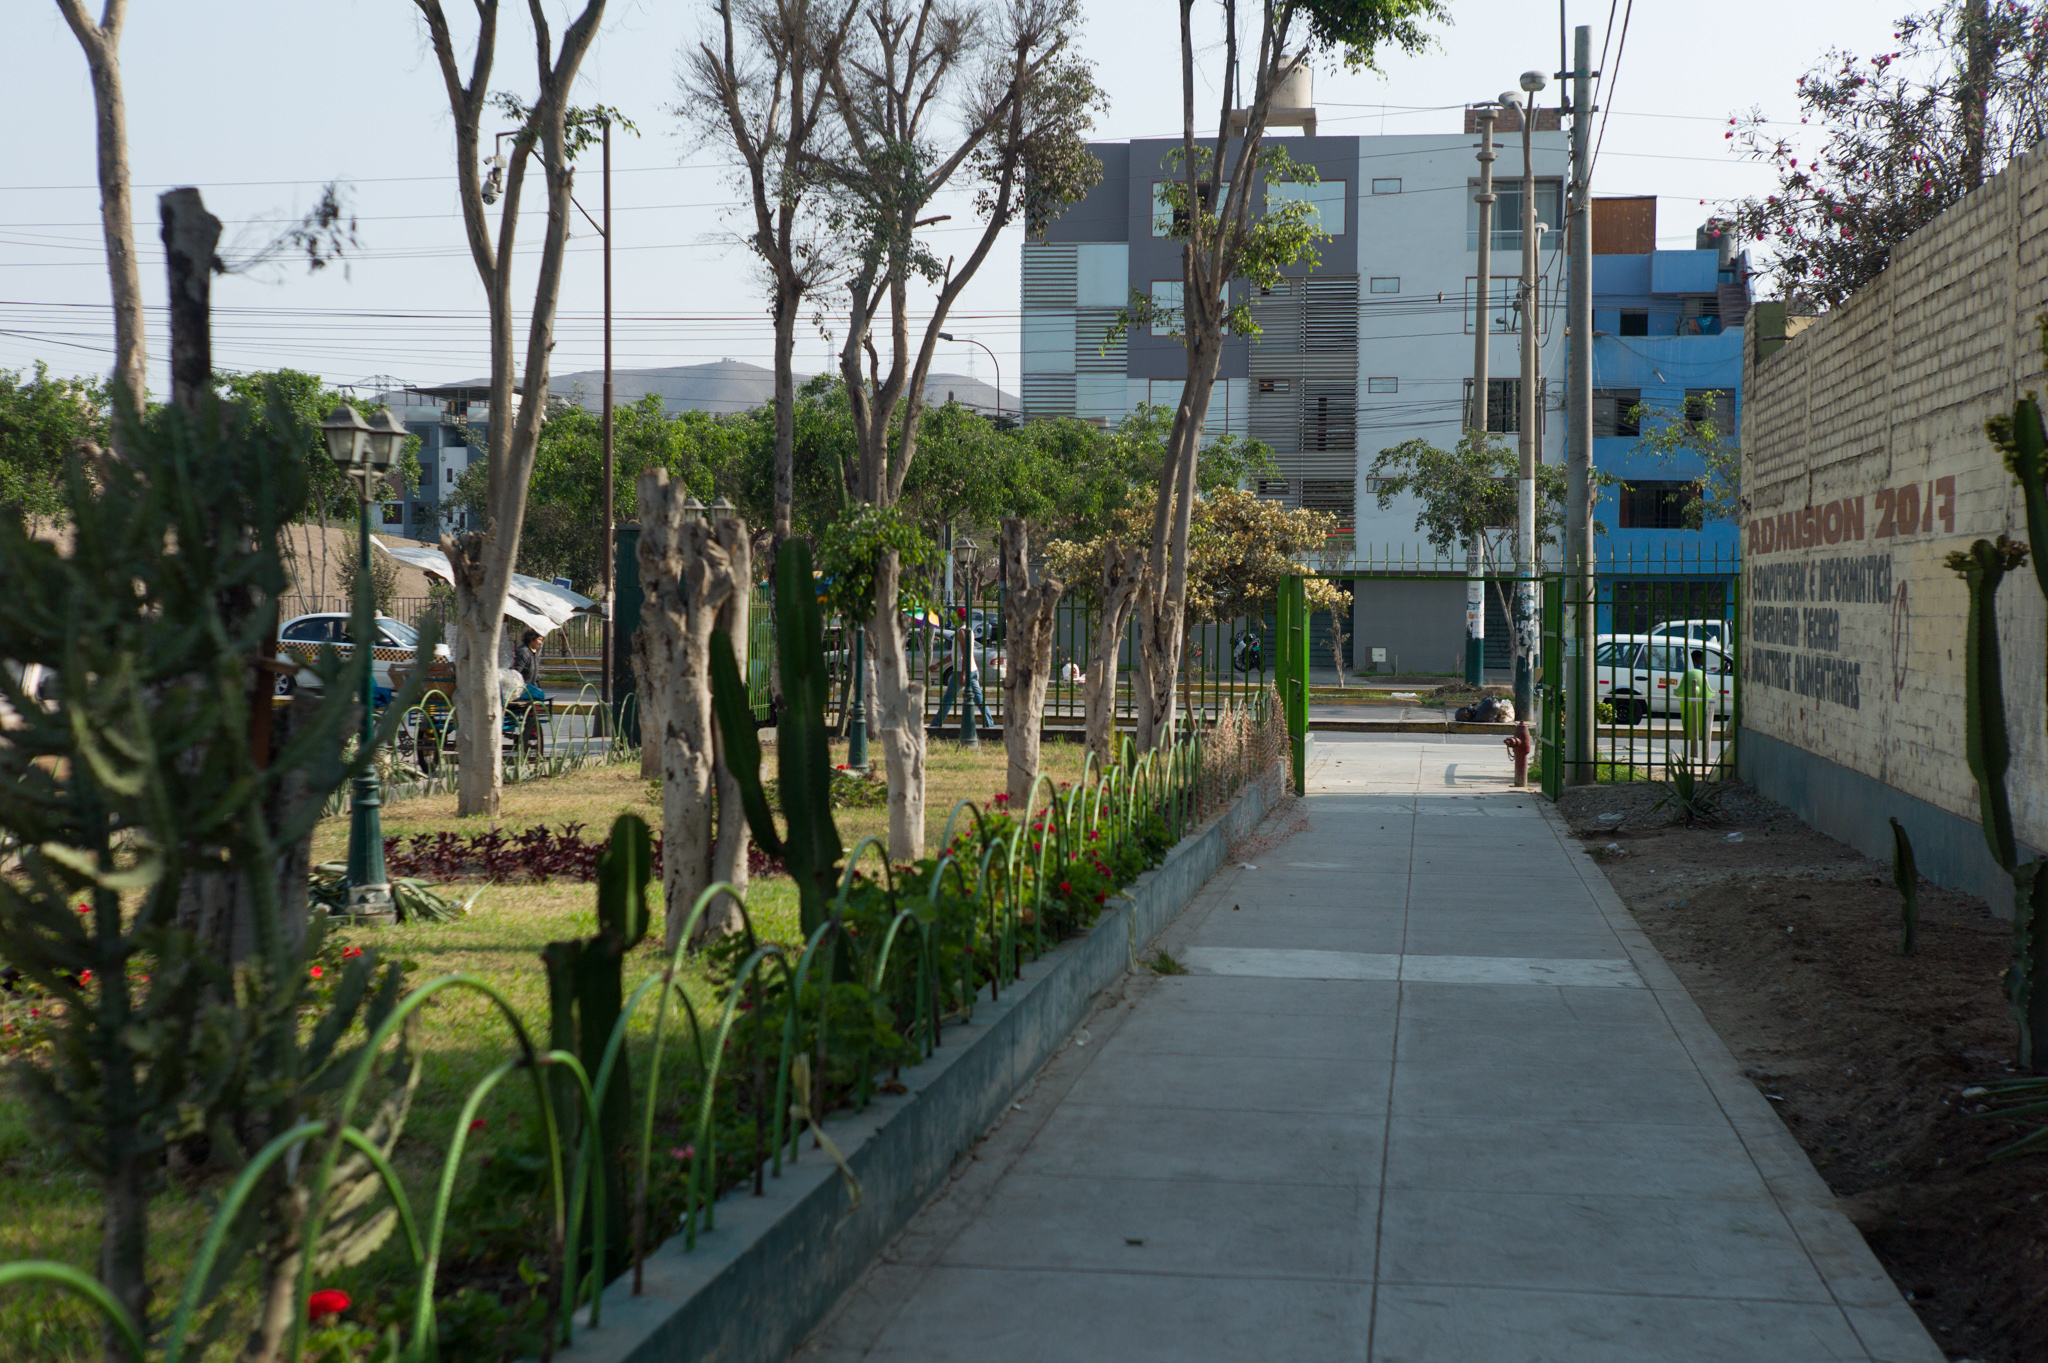 Small park inside a gated neighborhood.